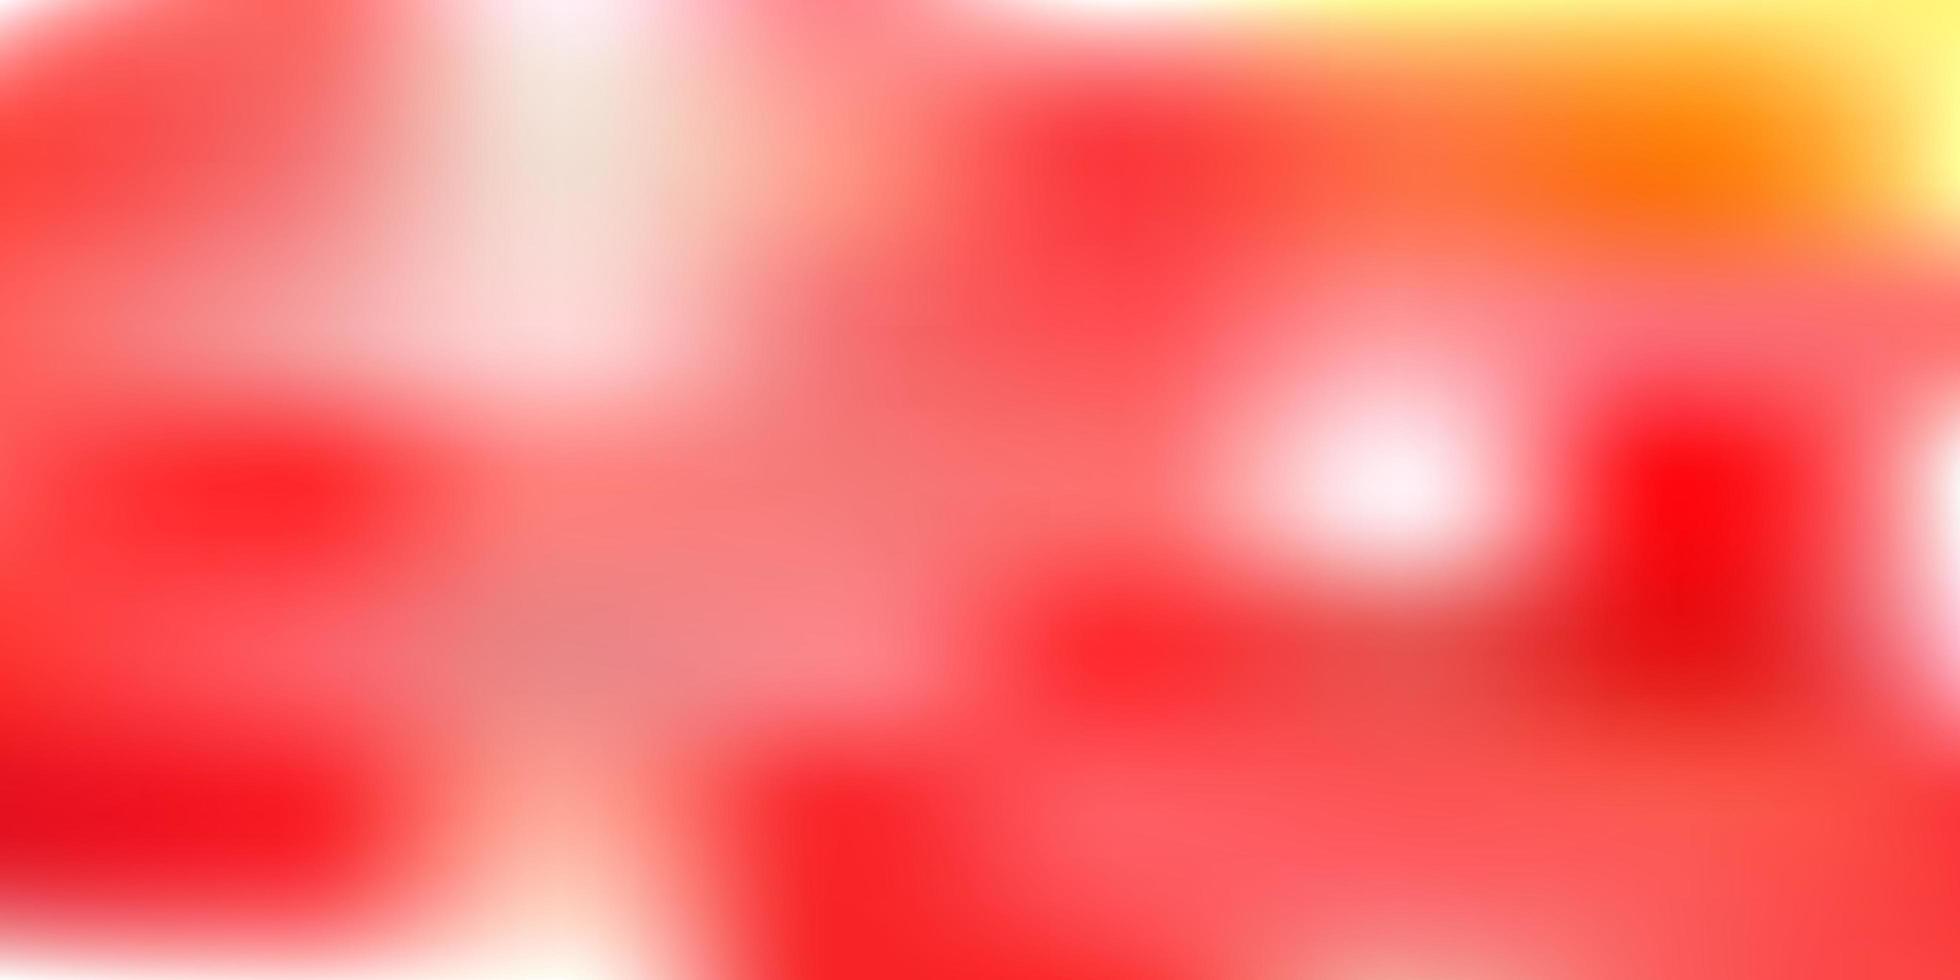 ljus orange vektor suddig layout.